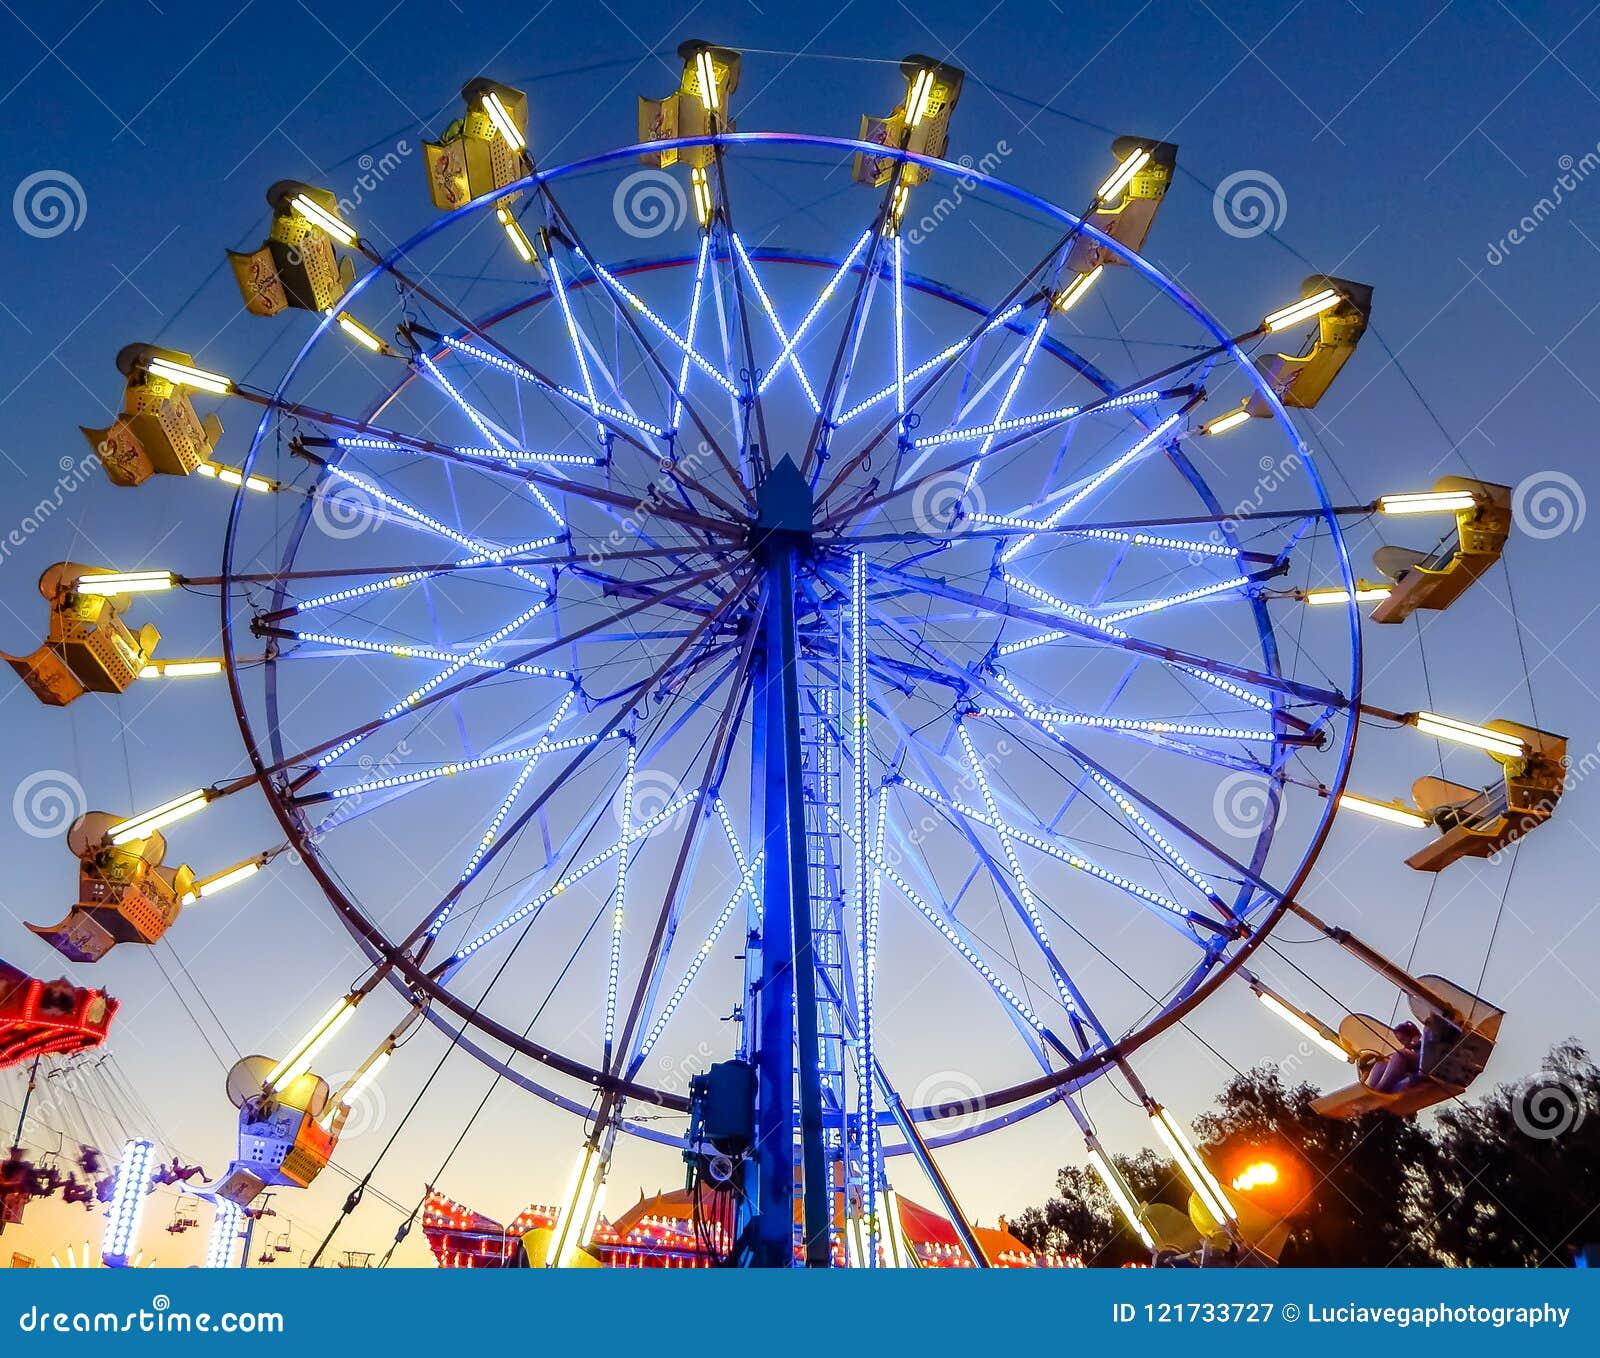 Blue Ferris Wheel Ride Of California State Fair Stock Image